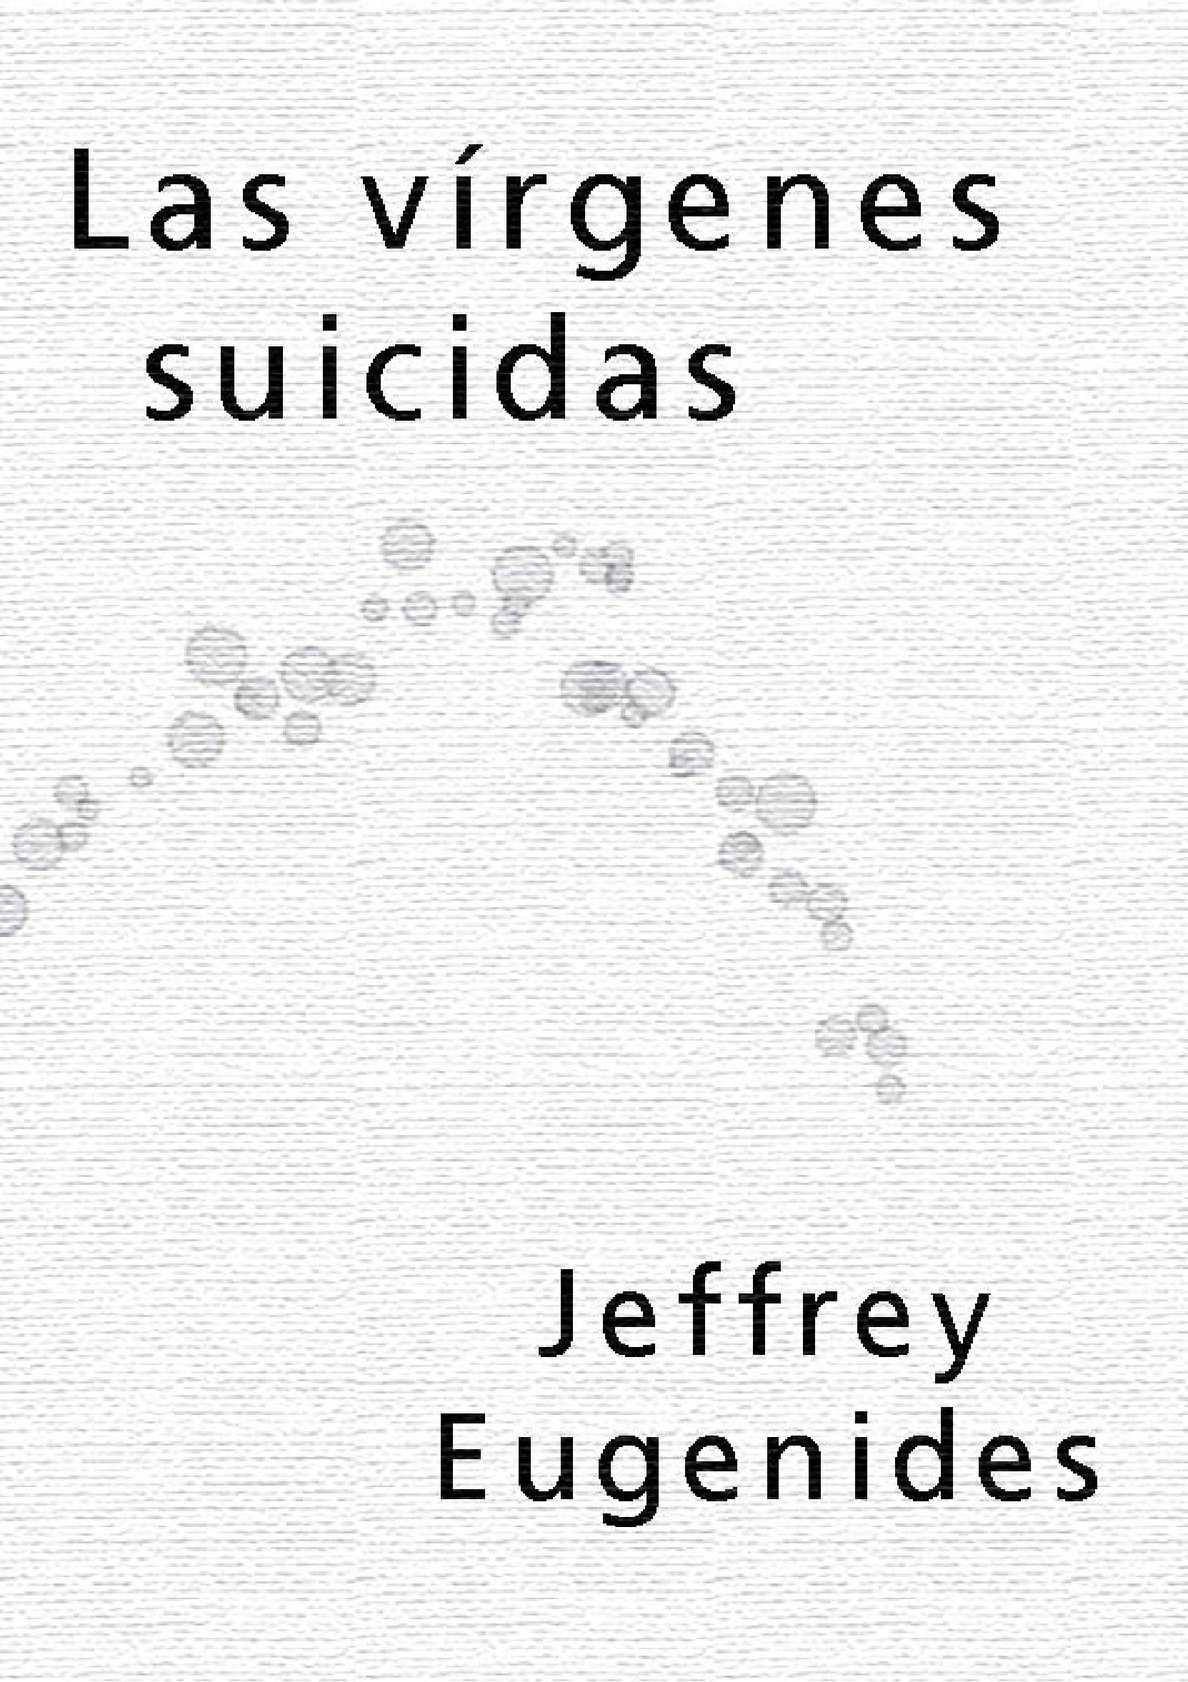 2ca6e311e40d Calaméo - Las virgenes suicidas